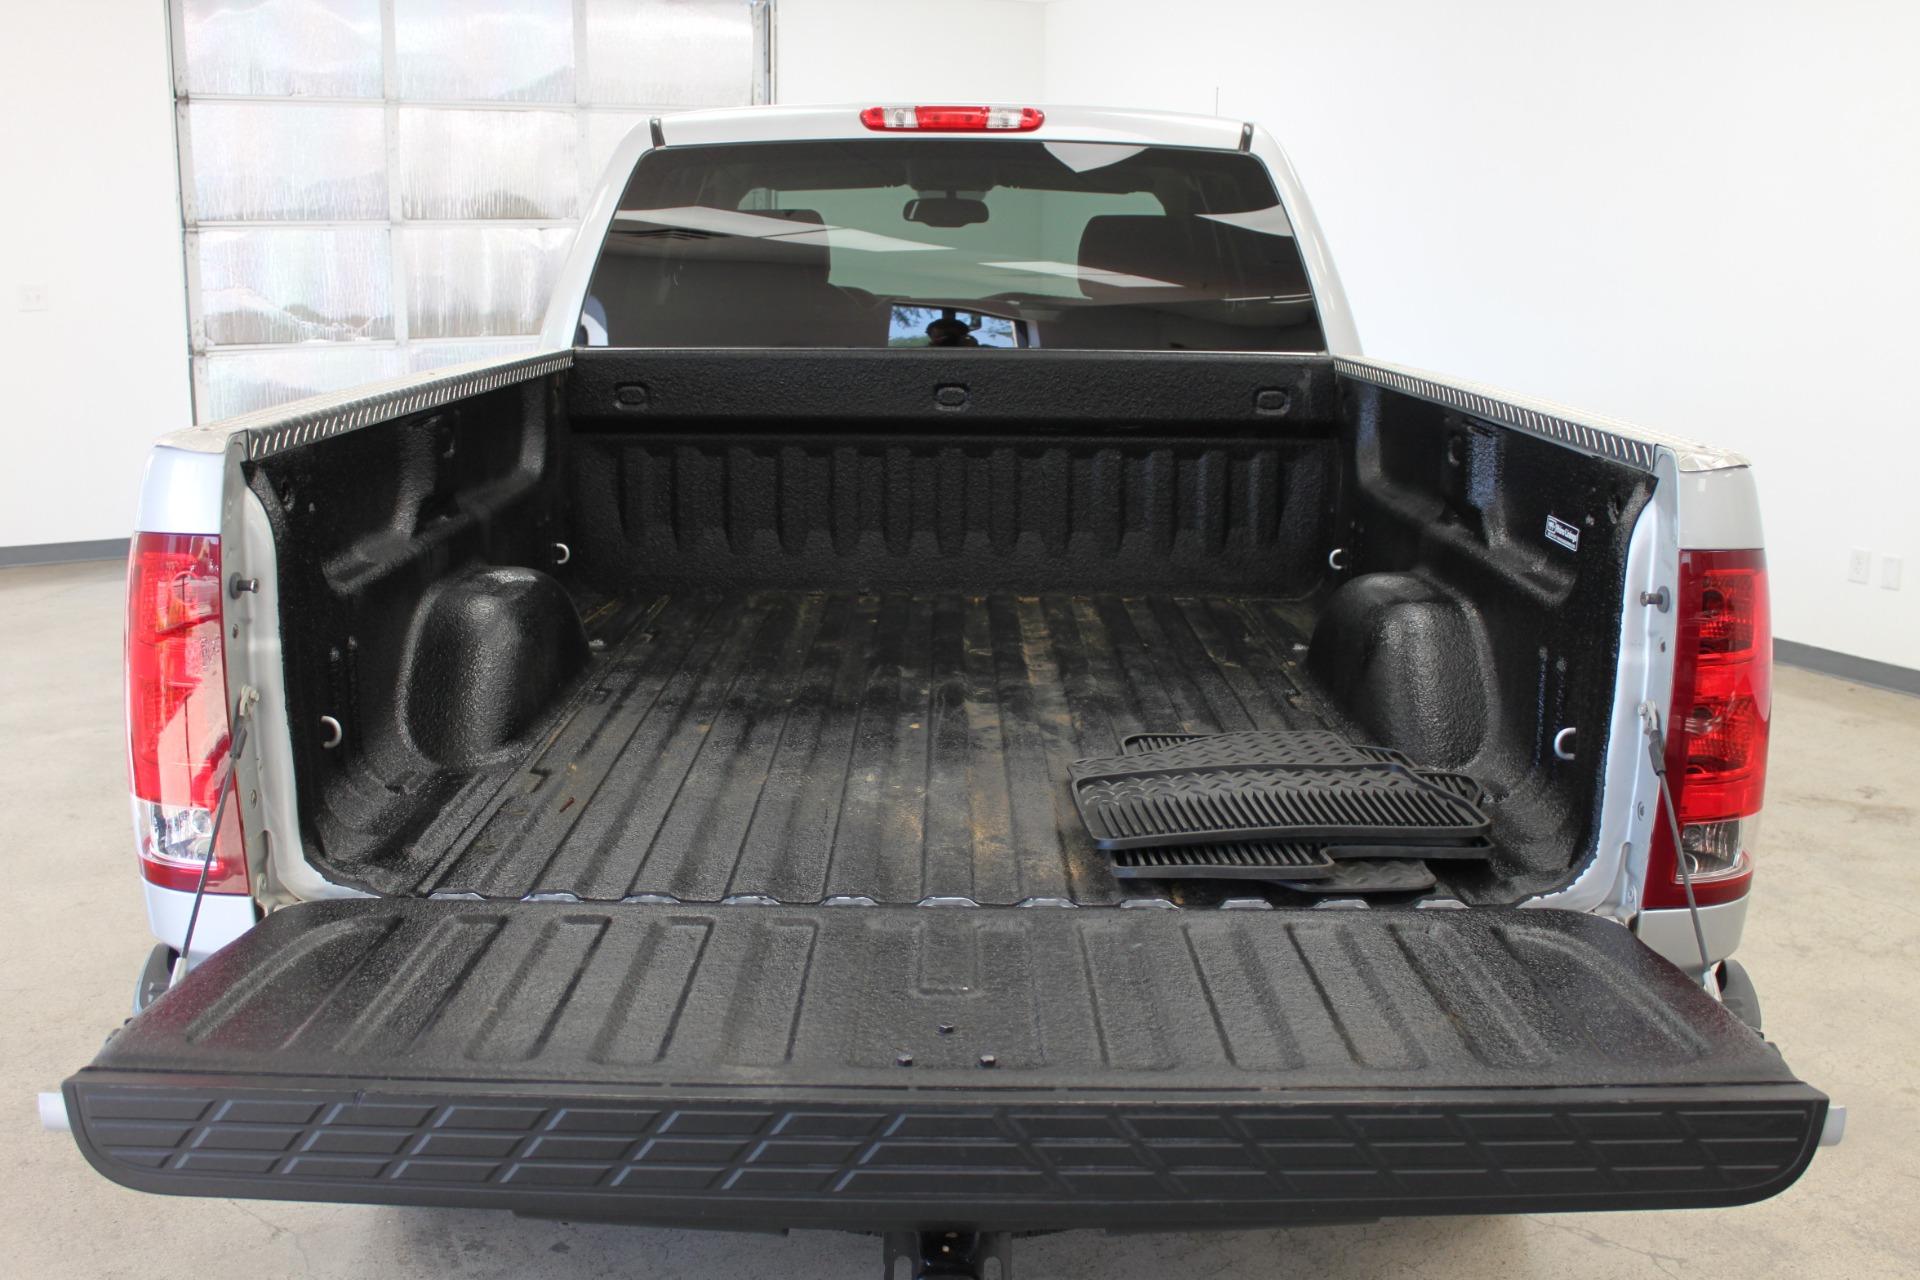 Used-2013-GMC-Sierra-1500-SLE-Z71-4X4-Land-Cruiser